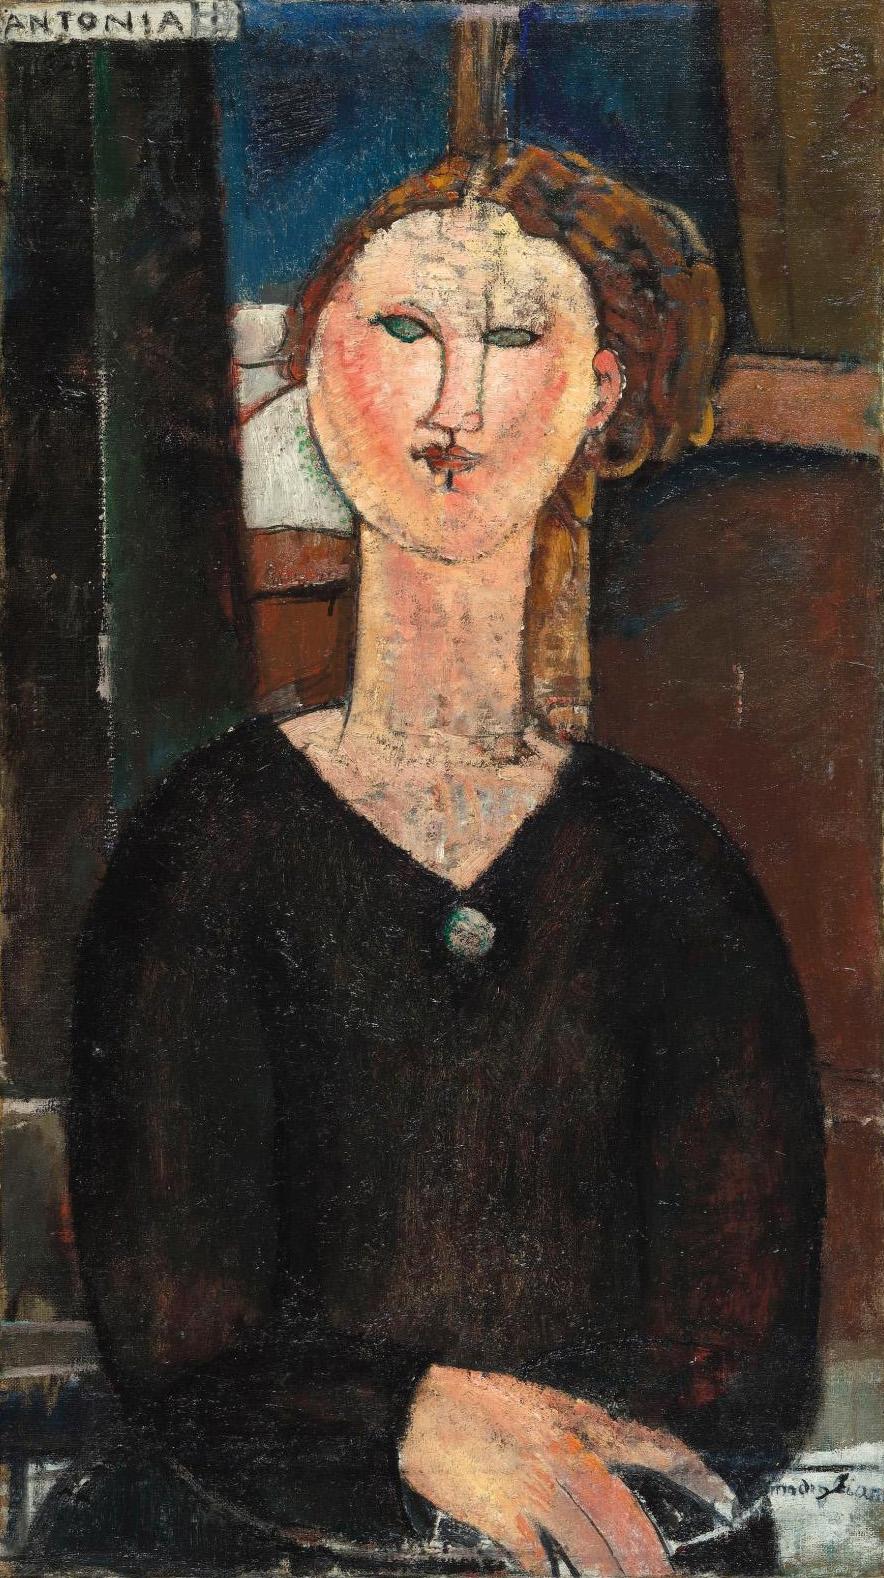 Antonia, c. 1915, oil on canvas, 82 x 46 cm/32.3 x 18.1 in. Musée de l'Orangerie.RMN-Grand Palais (Musée de l'Orangerie)/Hervé Lewandowski